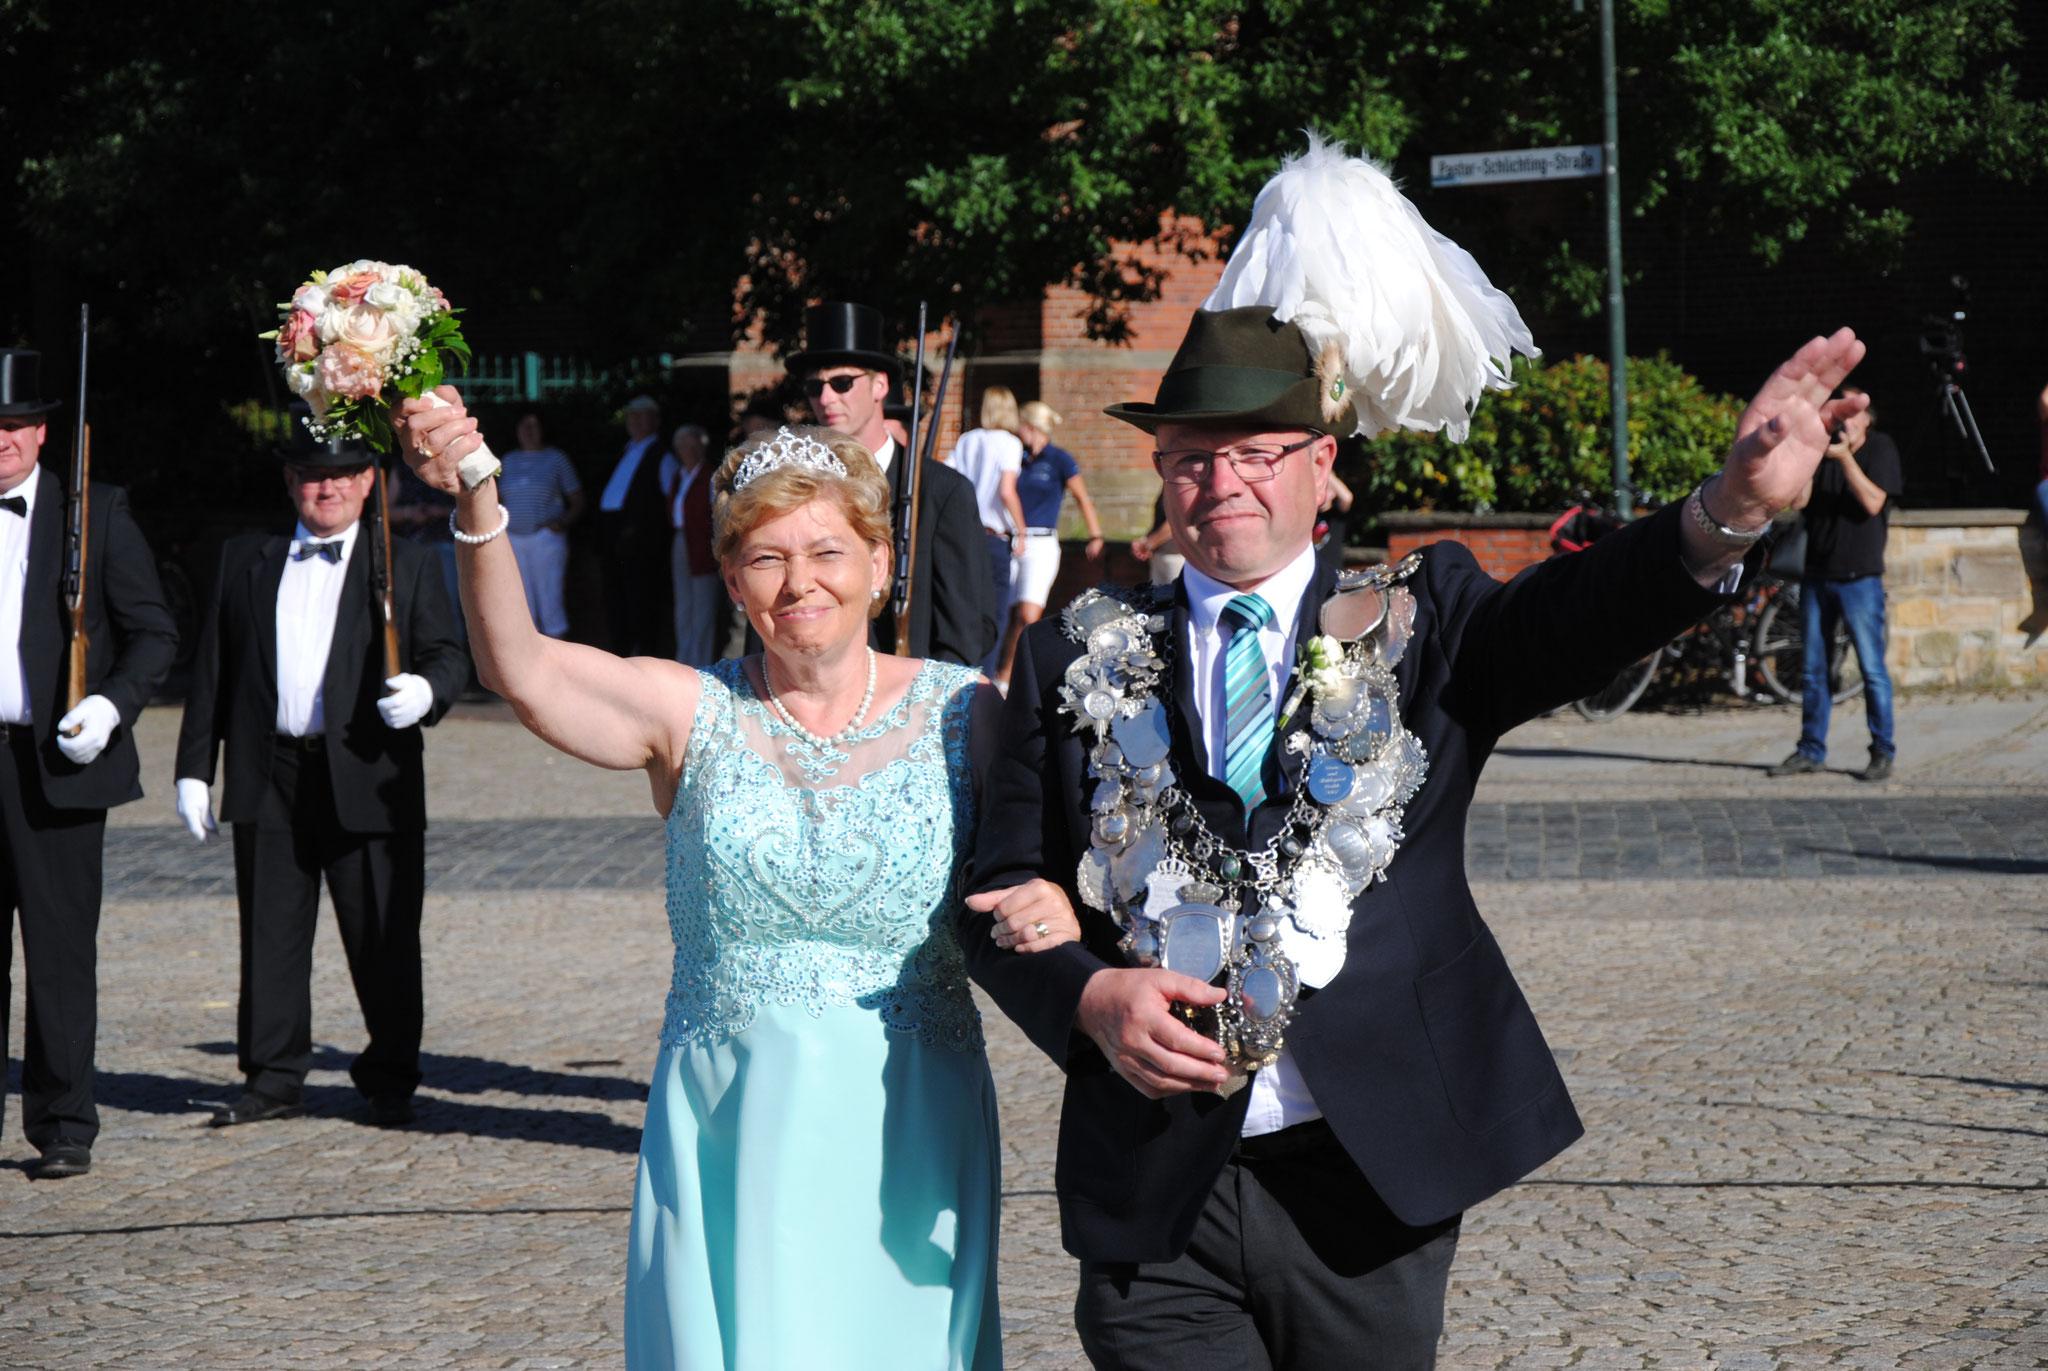 König Alwin Saalfeld und Margret Saalfeld im Jahr 2017